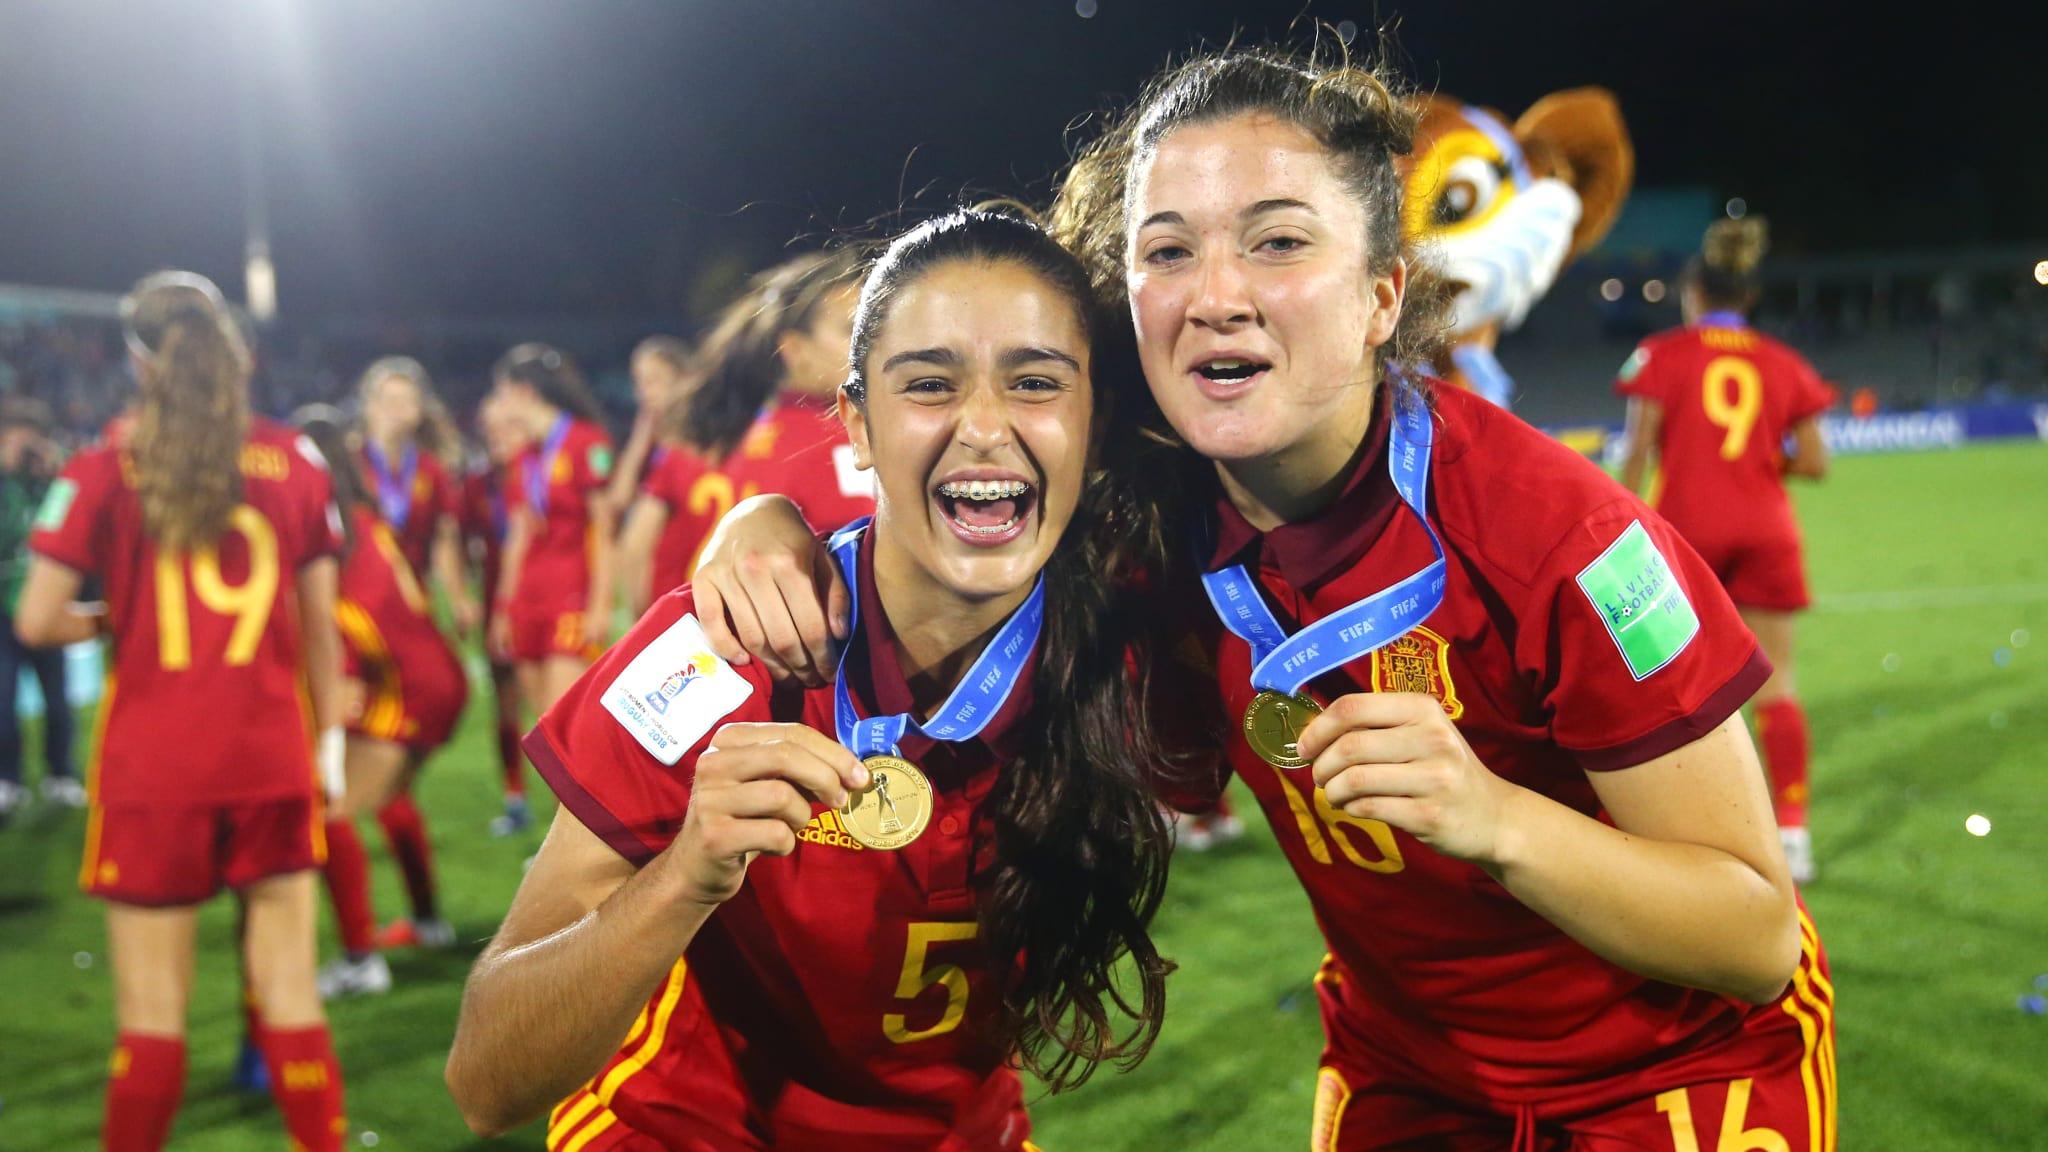 Jana Fernandez of Spain and Paula Arana celebrate after winning the FIFA U-17 Women's World Cup